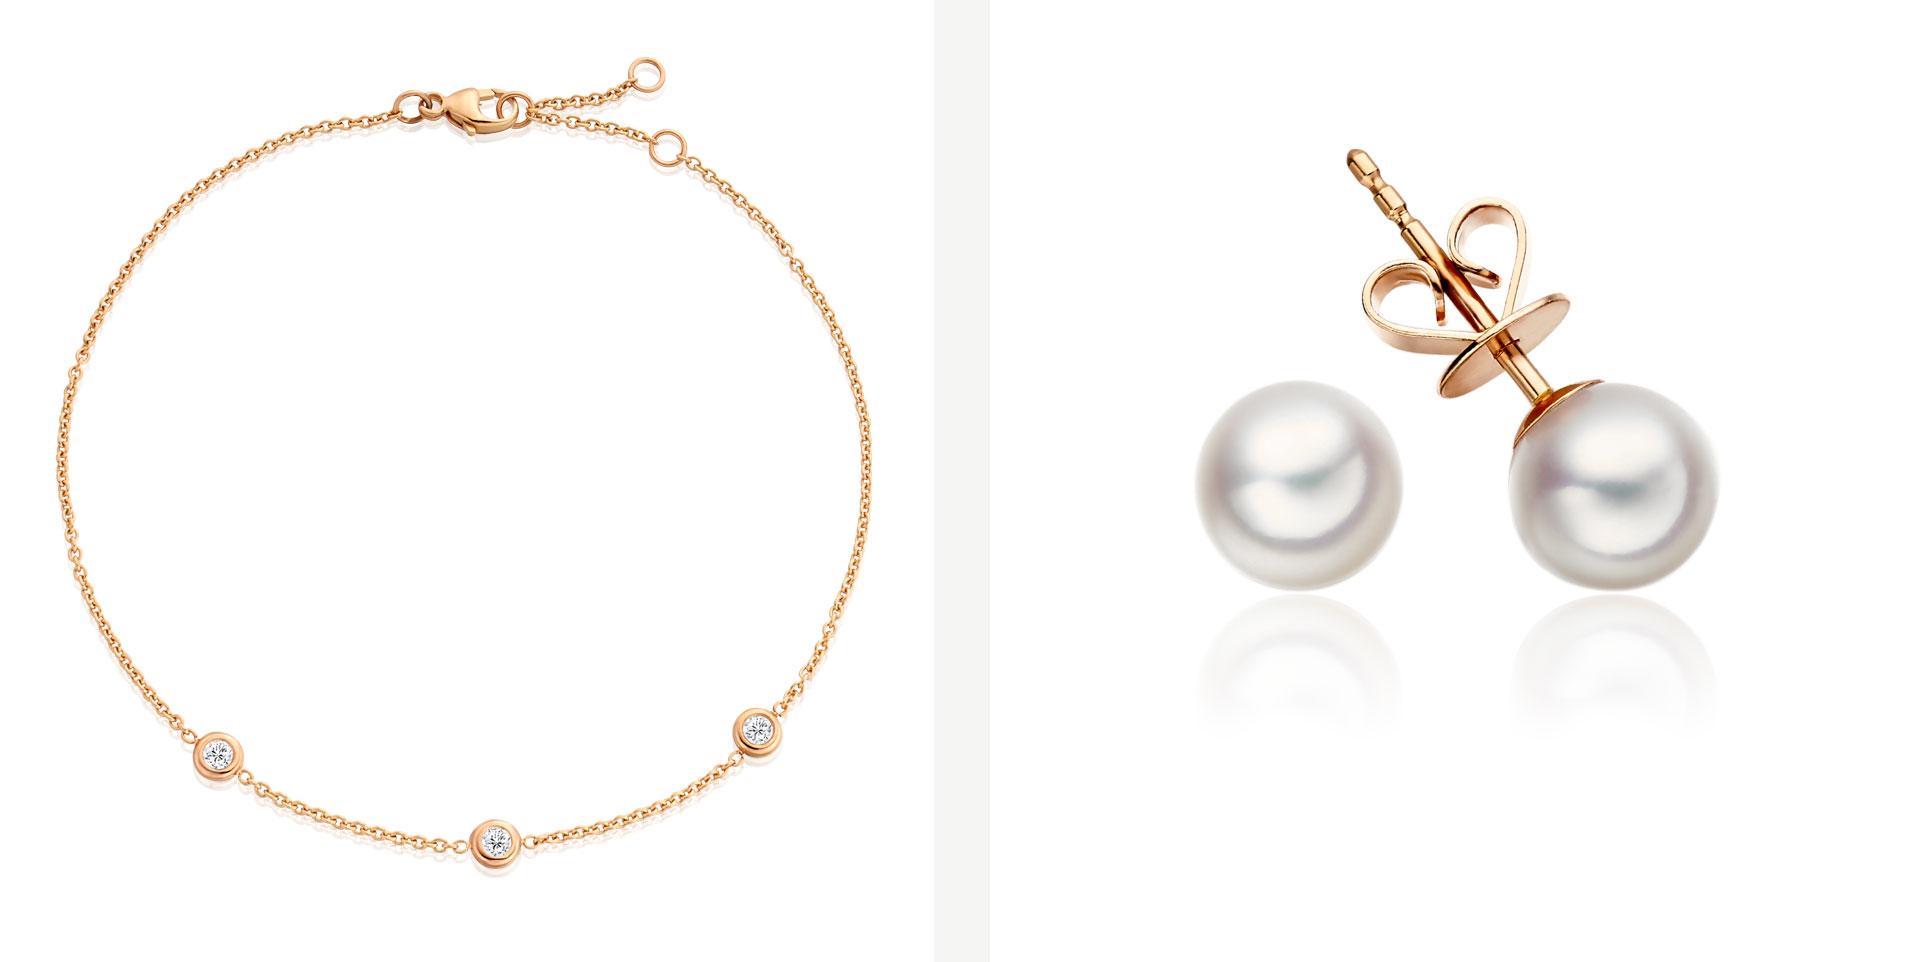 Diamond Bracelet and Akoya Pearl Earrings in Rose Gold